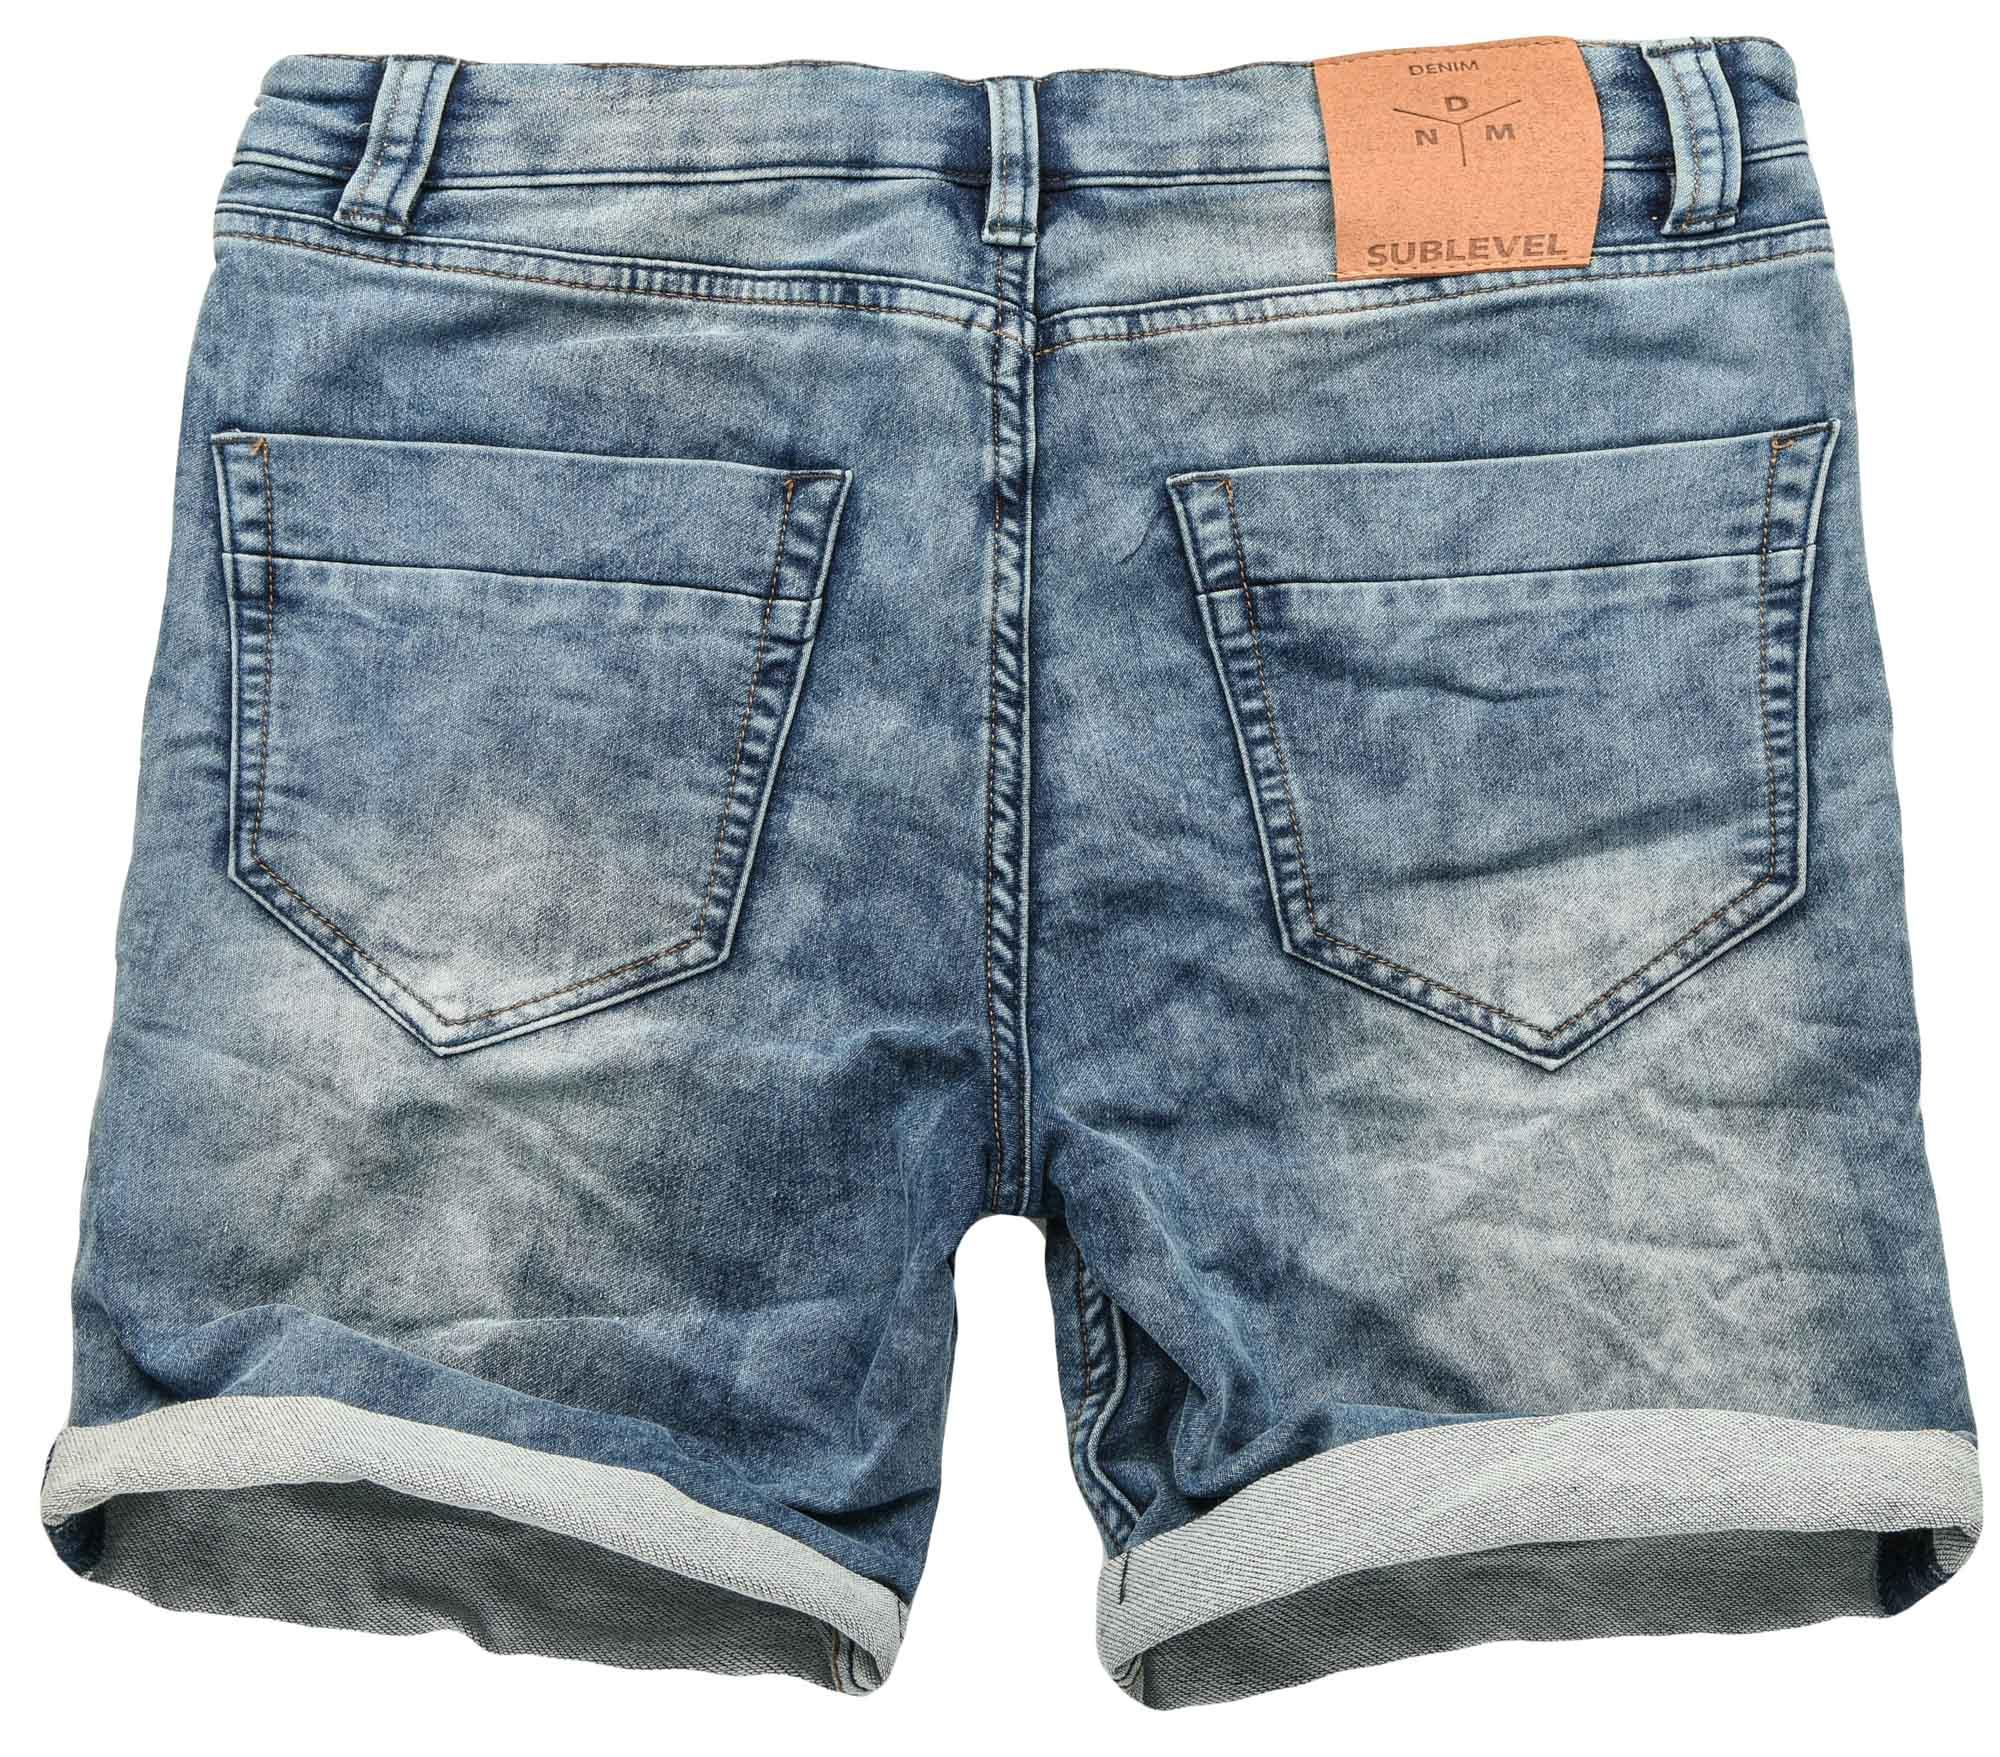 Sublevel-Herren-Sweat-Jeans-Shorts-kurze-Hose-Bermuda-Sommer-Sweathose-Slim-NEU Indexbild 15